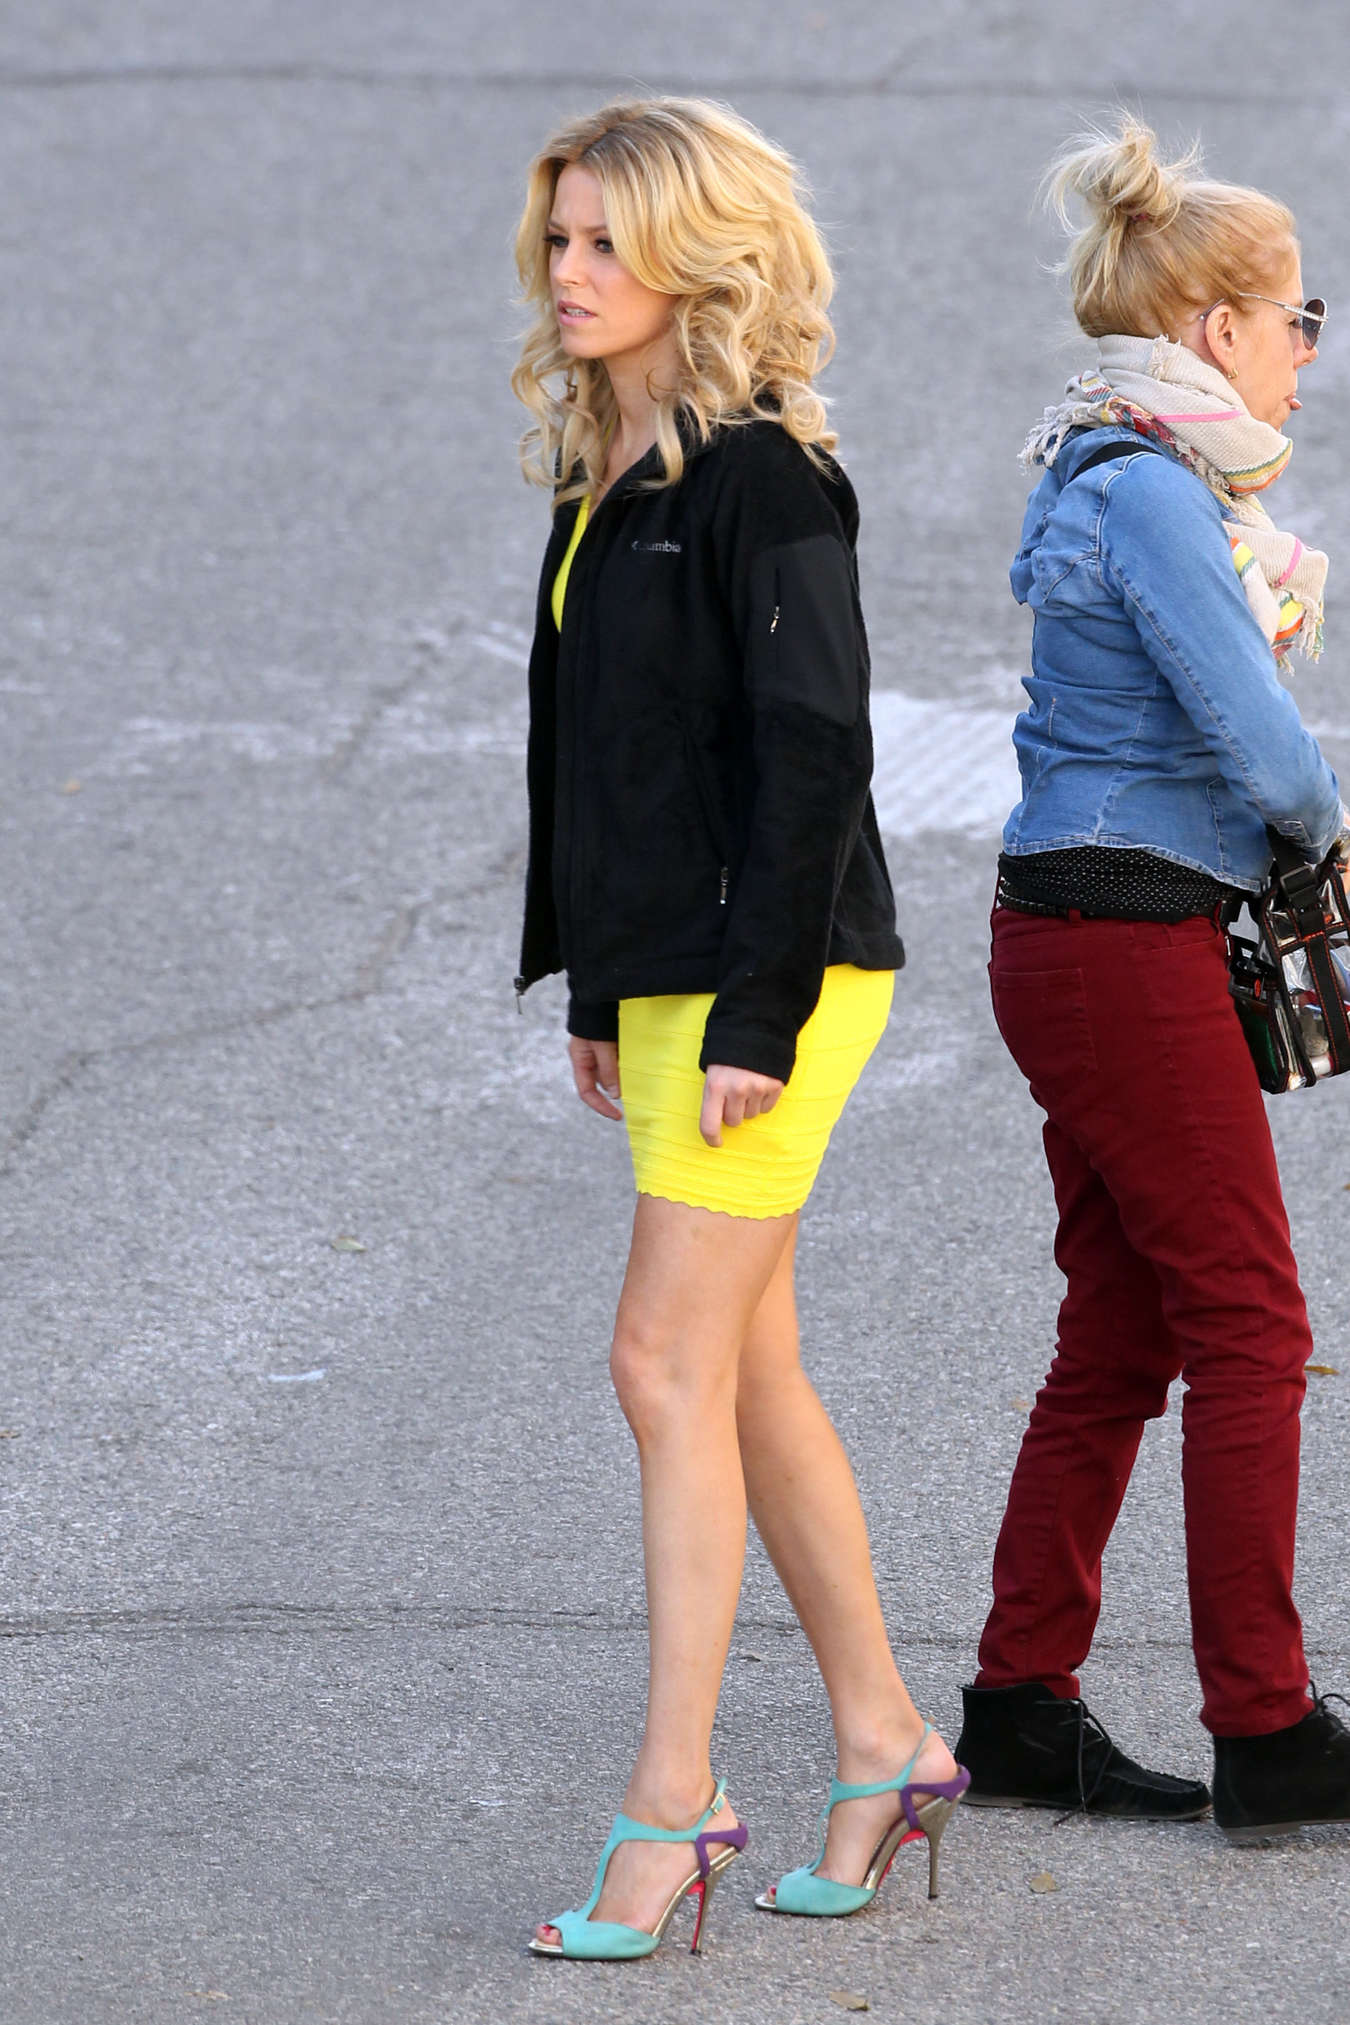 Elizabeth Banks Filming Walk Shame Yellow Dress Jpg Pictures to pin on ...